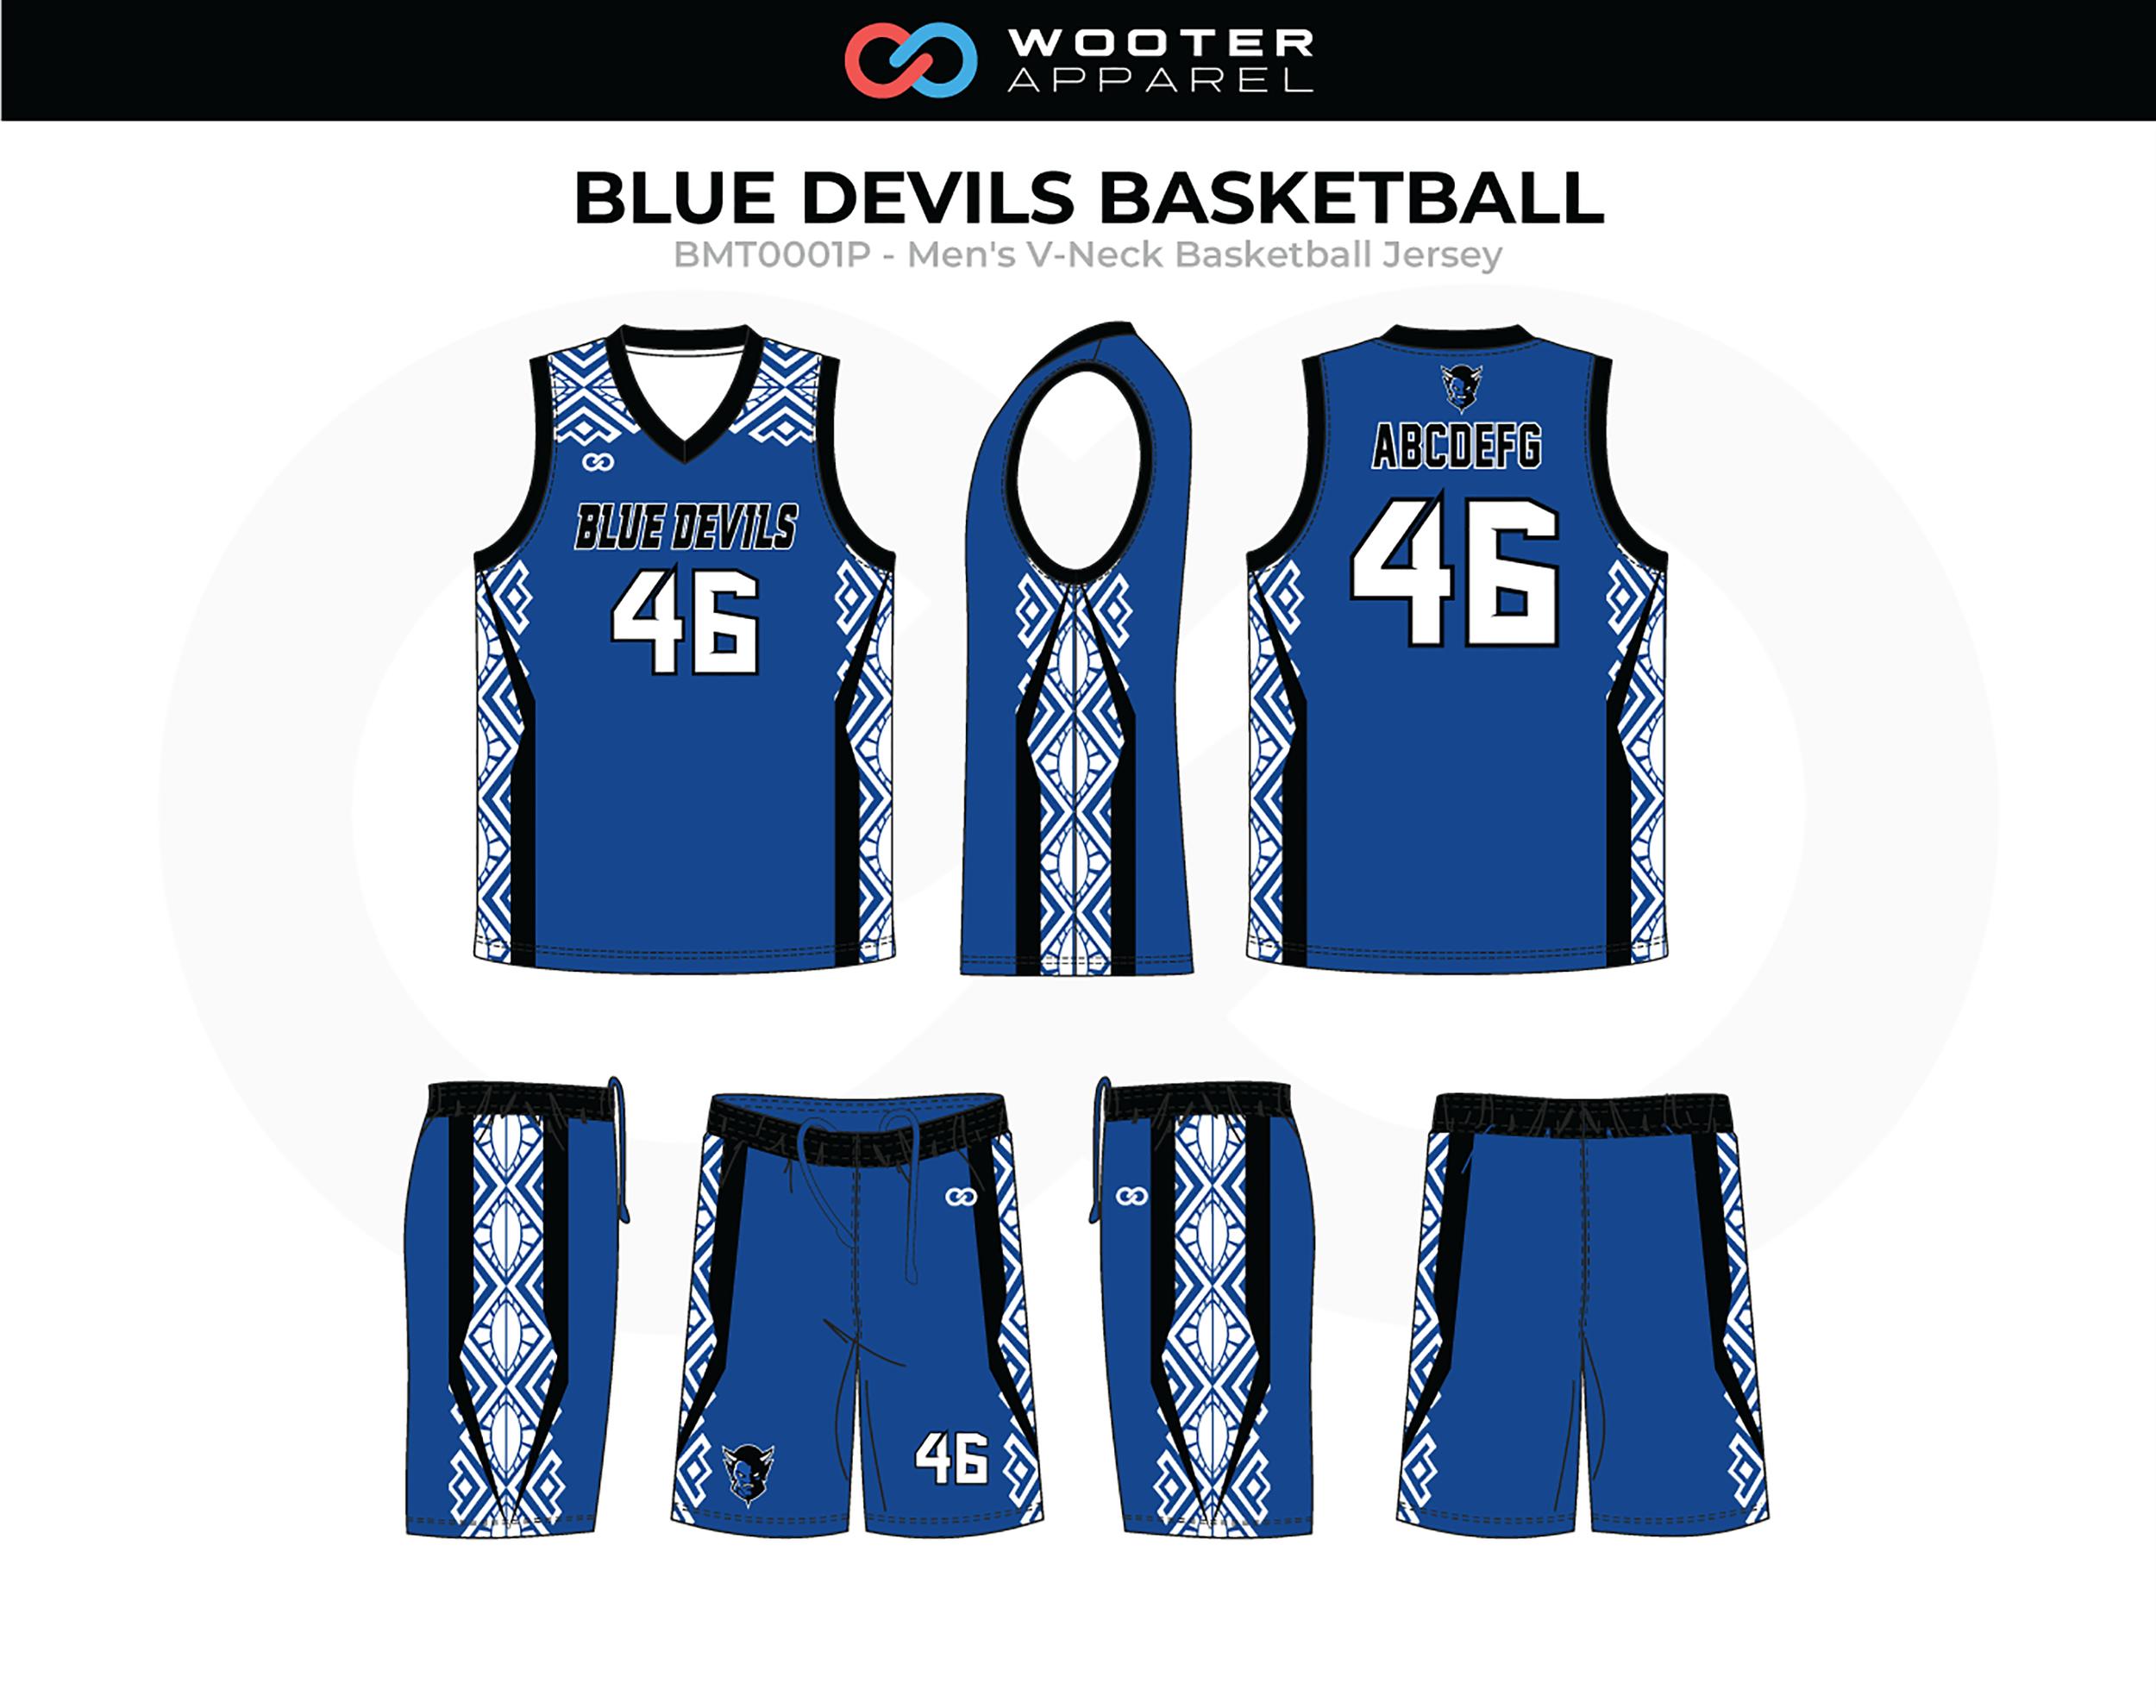 BLUE DEVILS Blue White Black Men's V-Neck Basketball Uniform, Jersey and Shorts